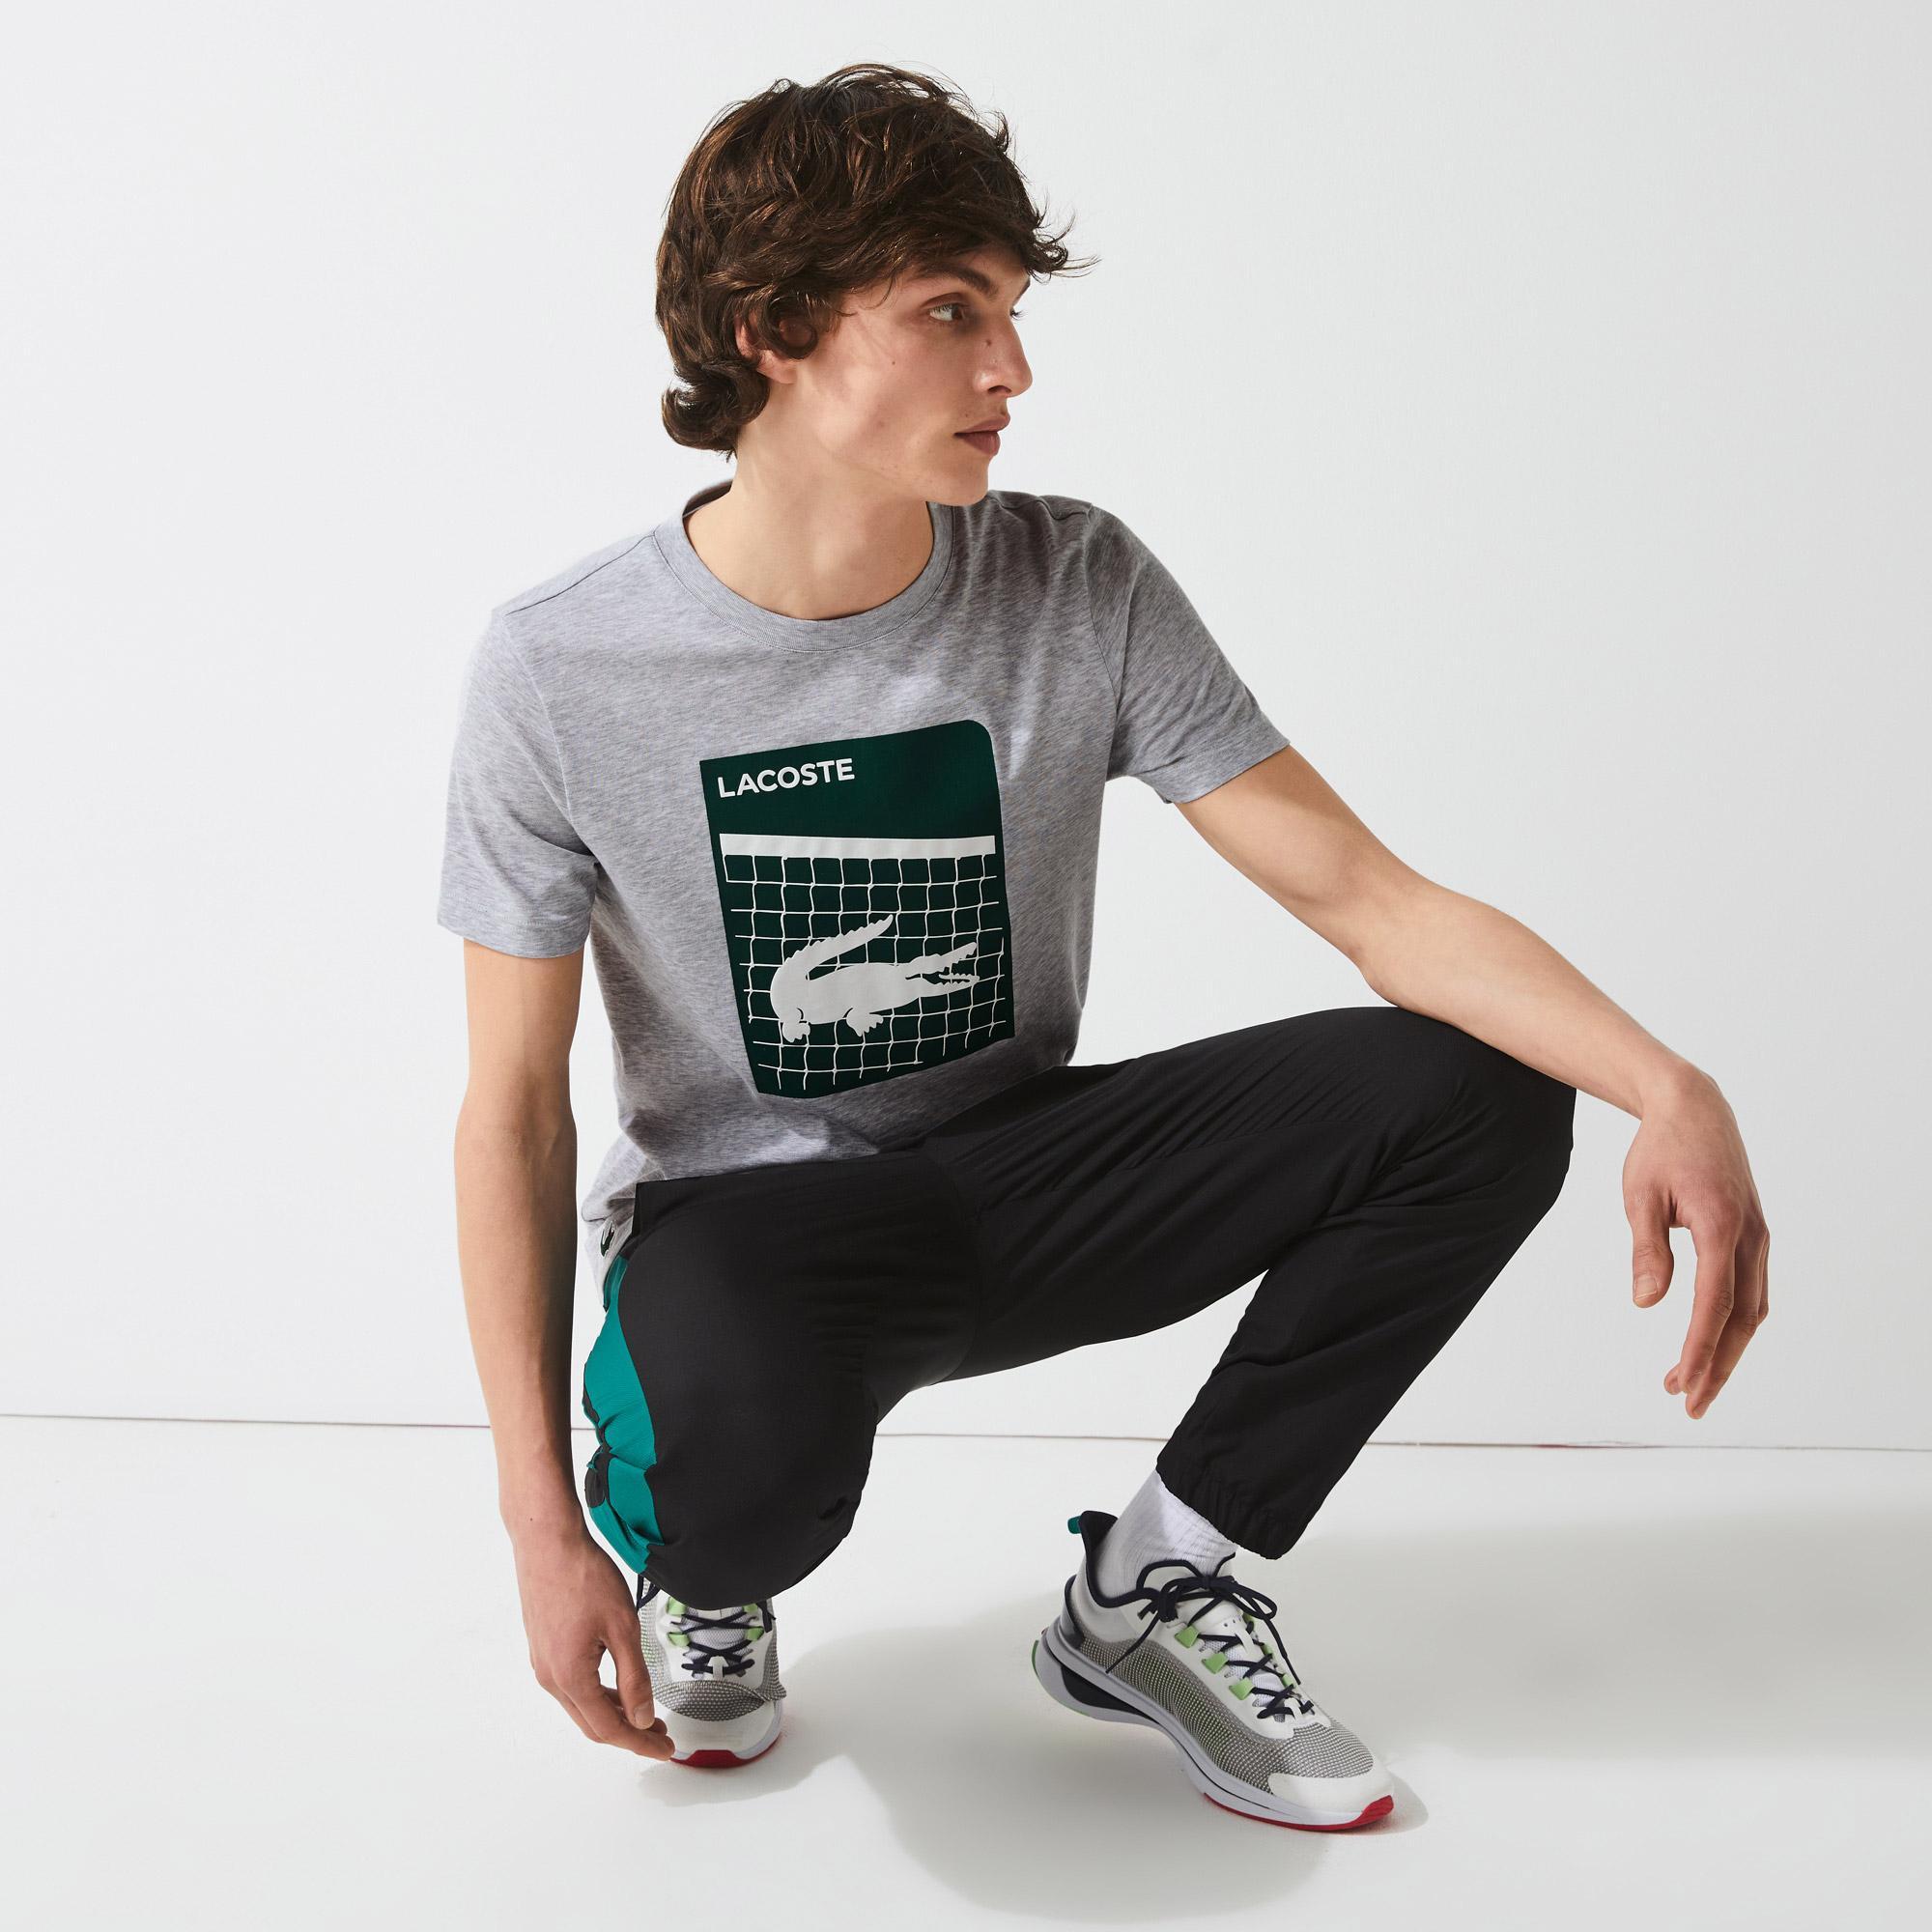 Lacoste Sport Erkek Bisiklet Yaka Baskılı Gri T-Shirt